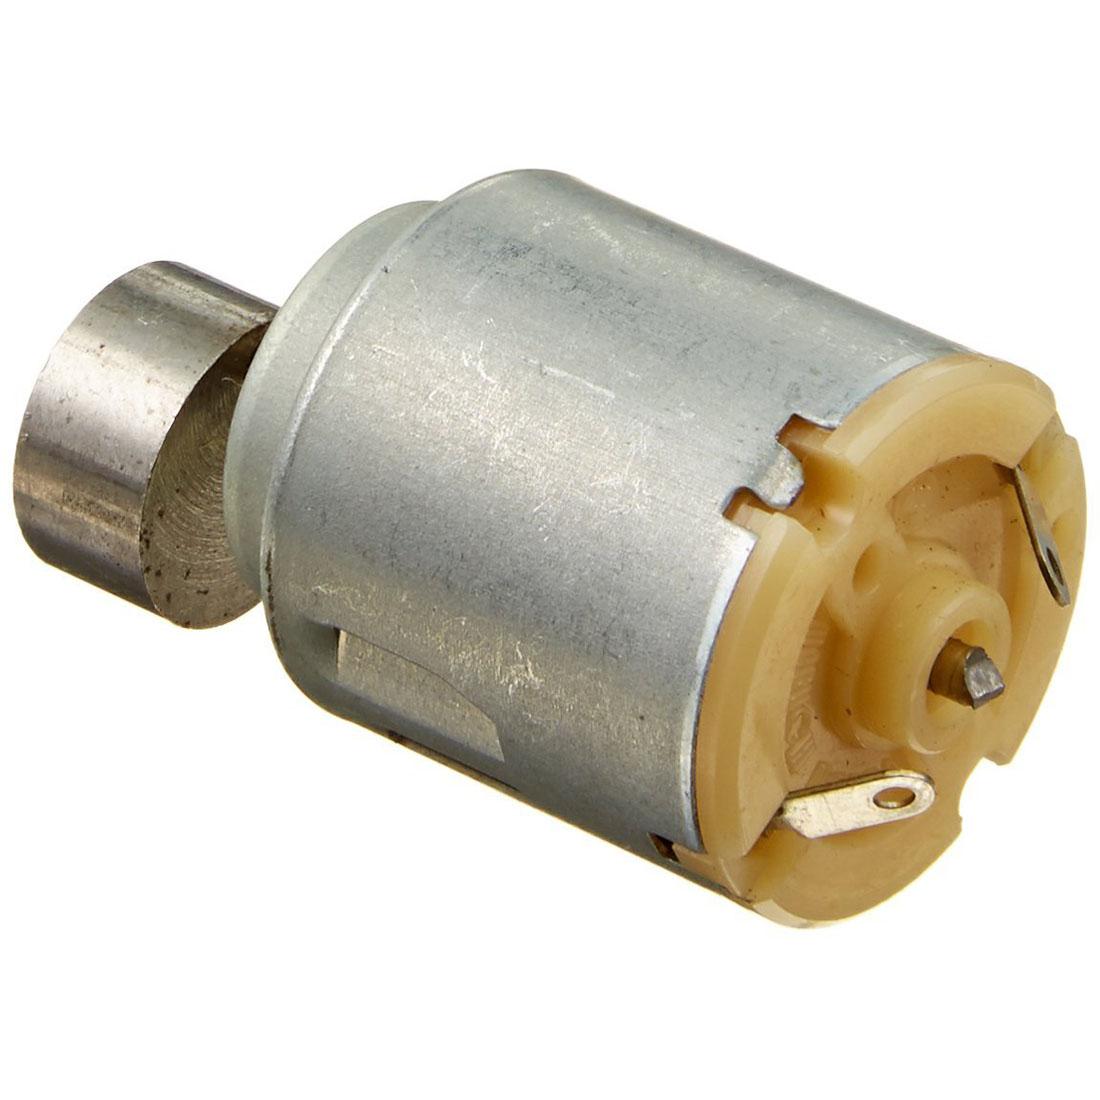 7000rpm Output Speed Dc 3v Electric Vibration Motor